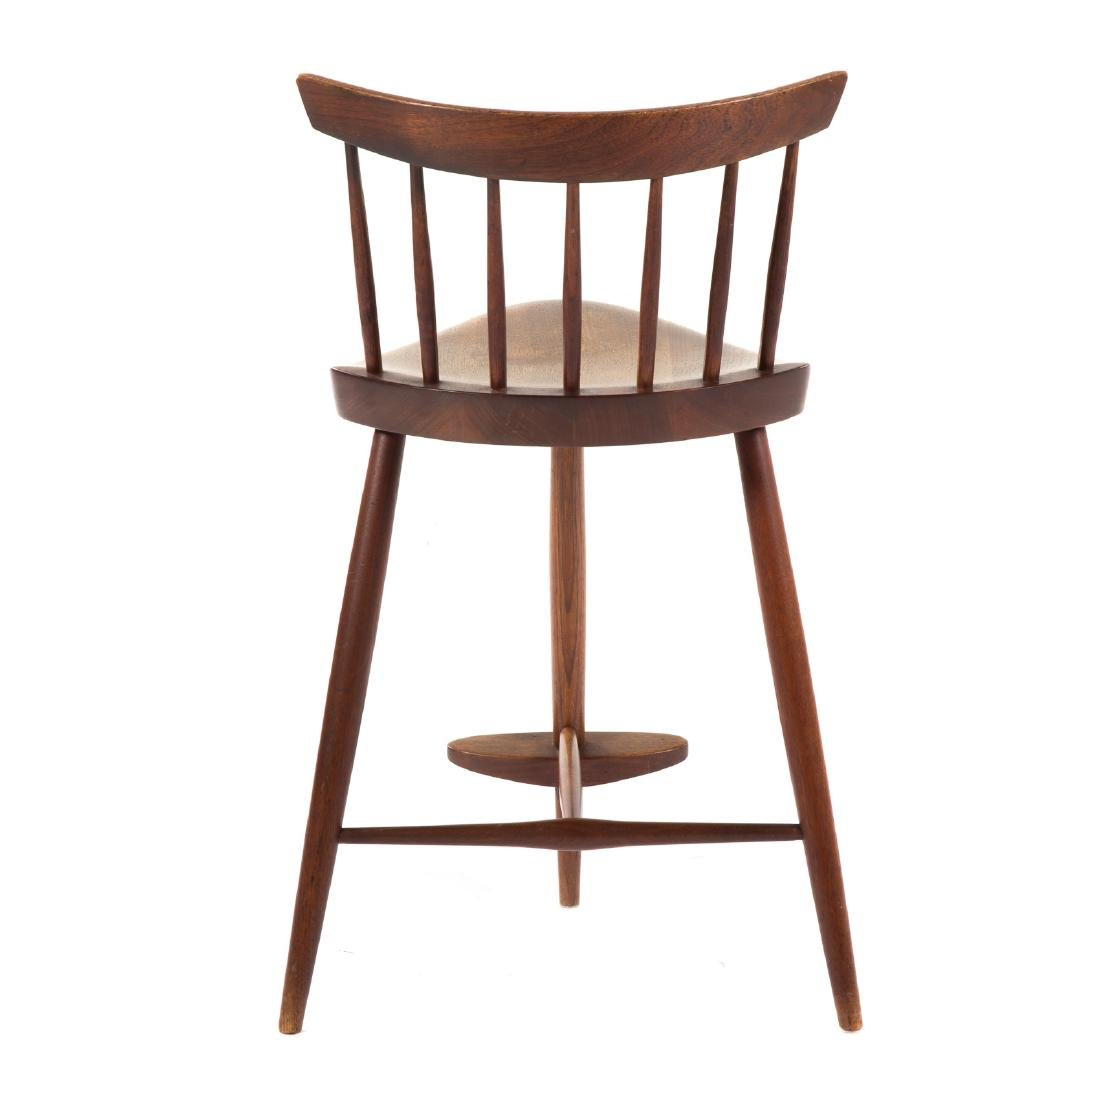 George Nakashima High Mira Chair - 4